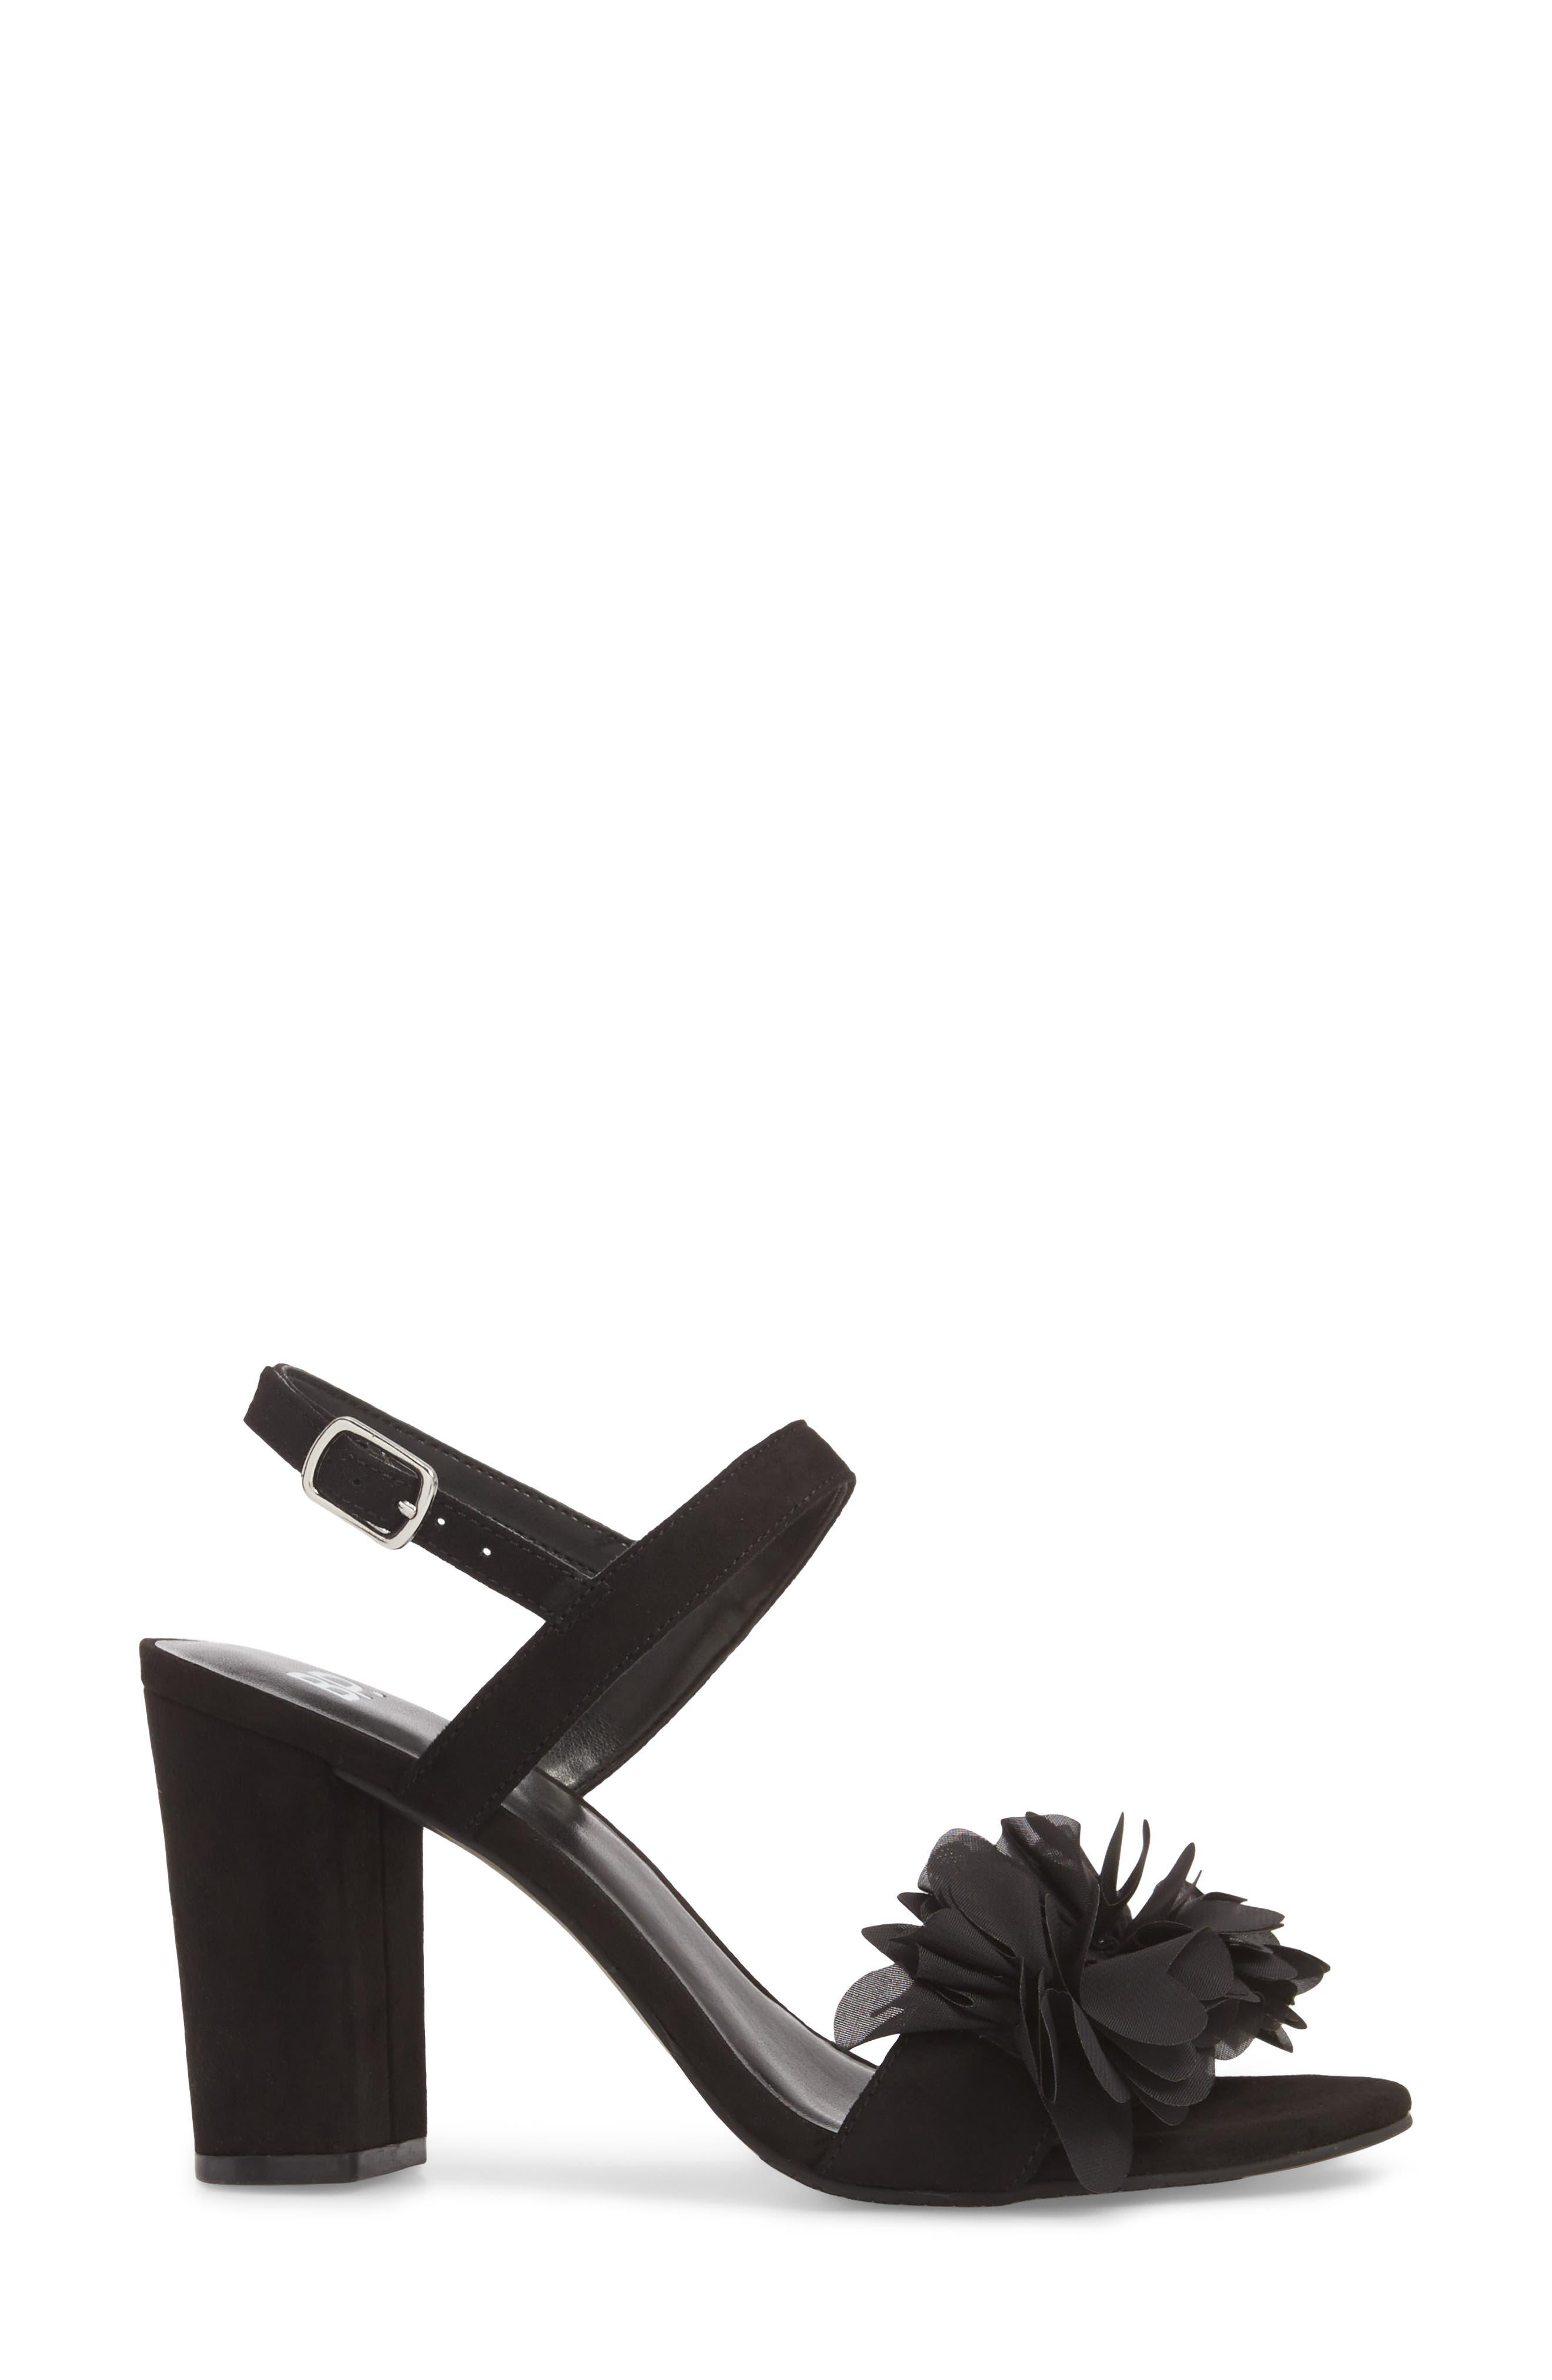 Lula Block Heel Slingback Sandal,                             Alternate thumbnail 3, color,                             Black Flowers Fabric